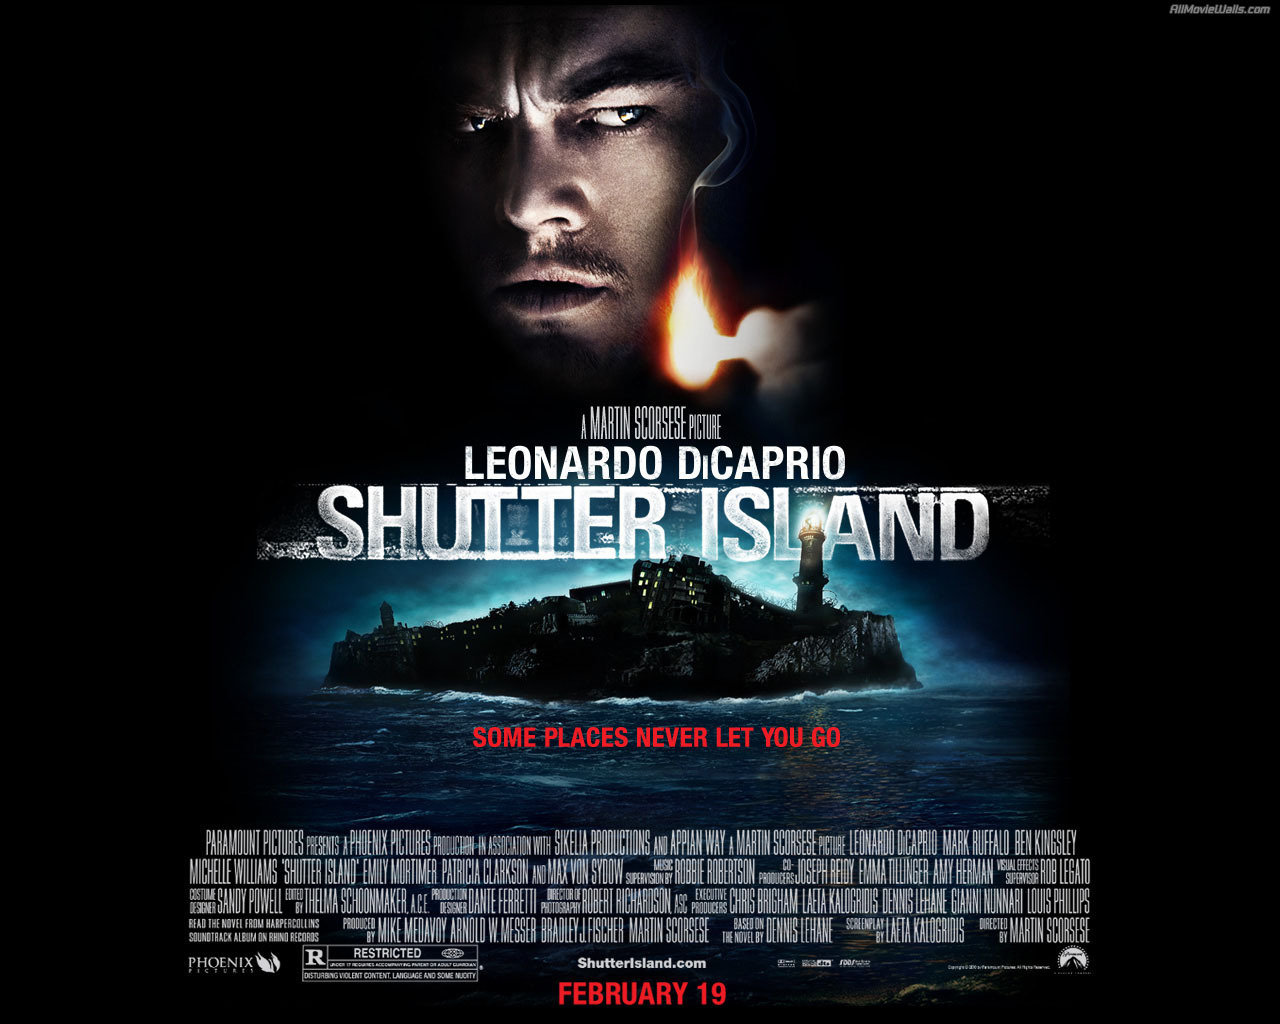 Film Comme Shuter Island